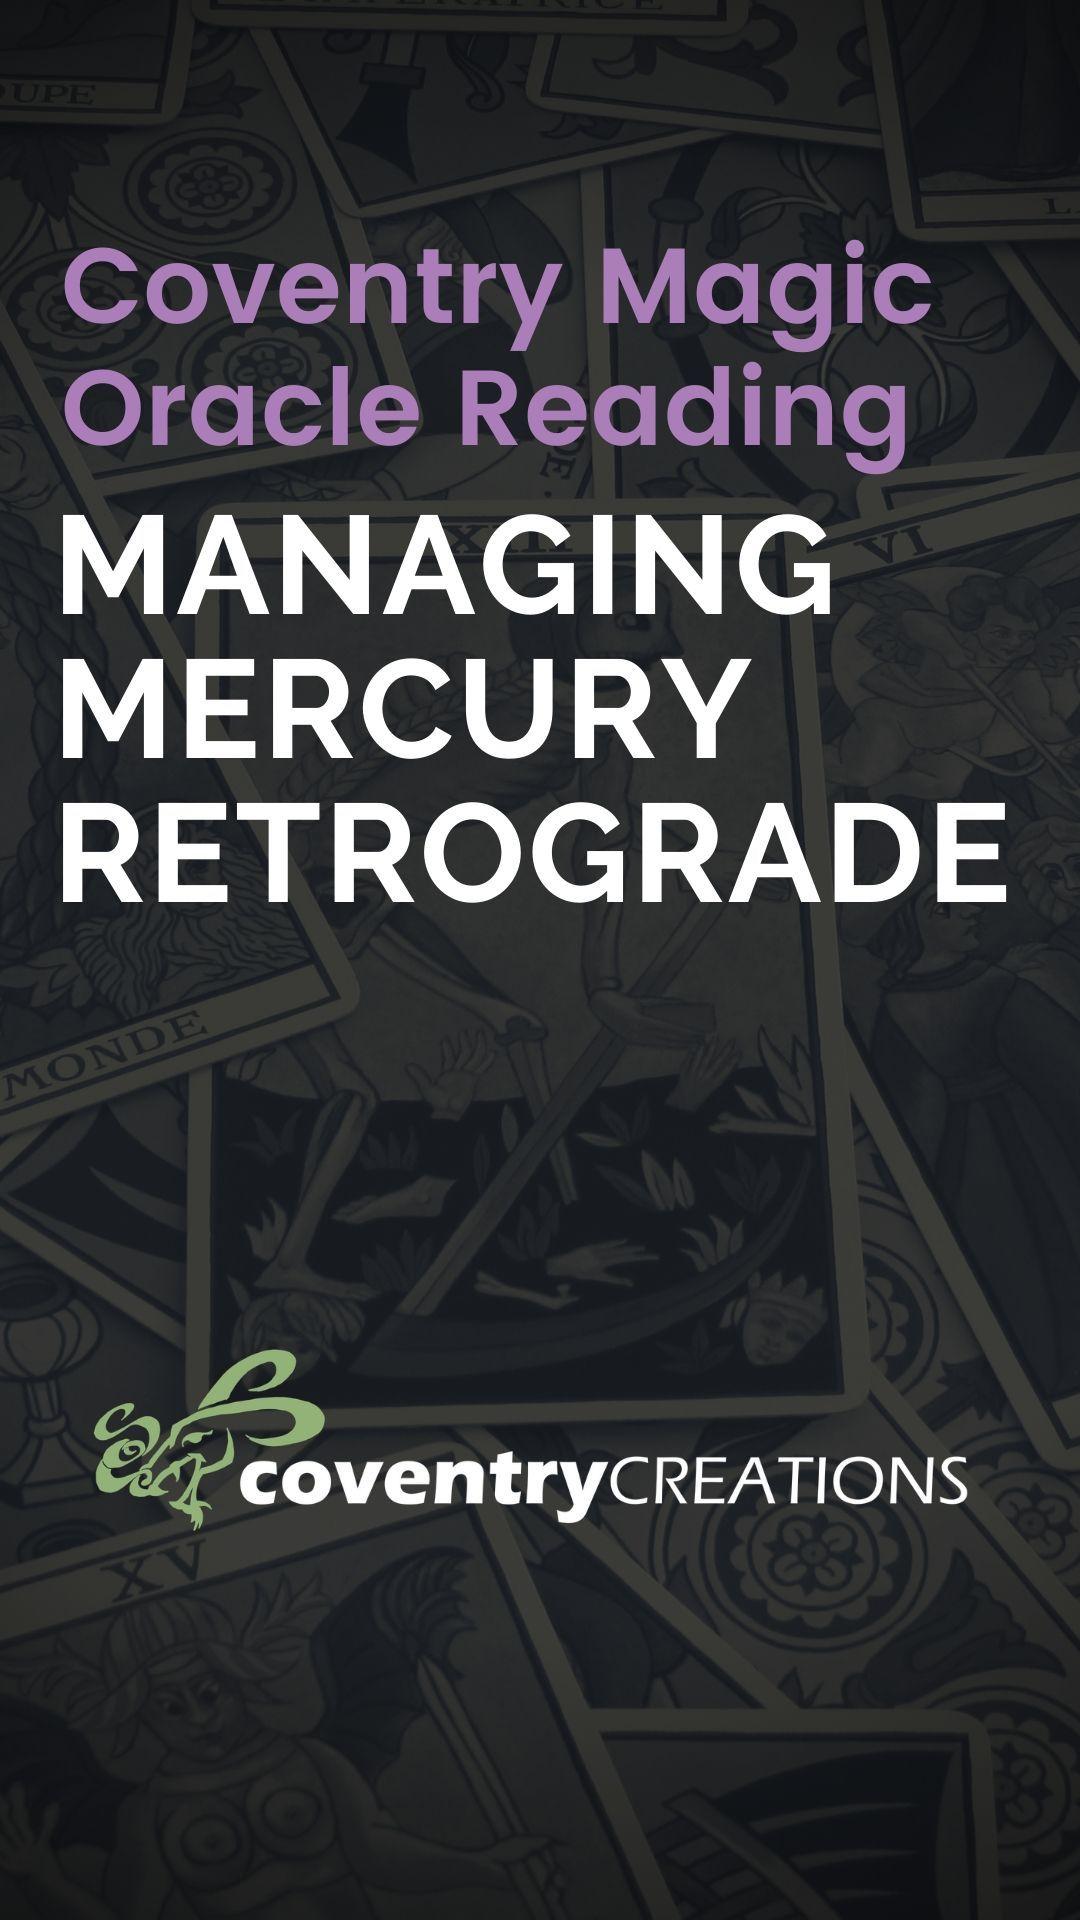 Managing Mercury Retrograde